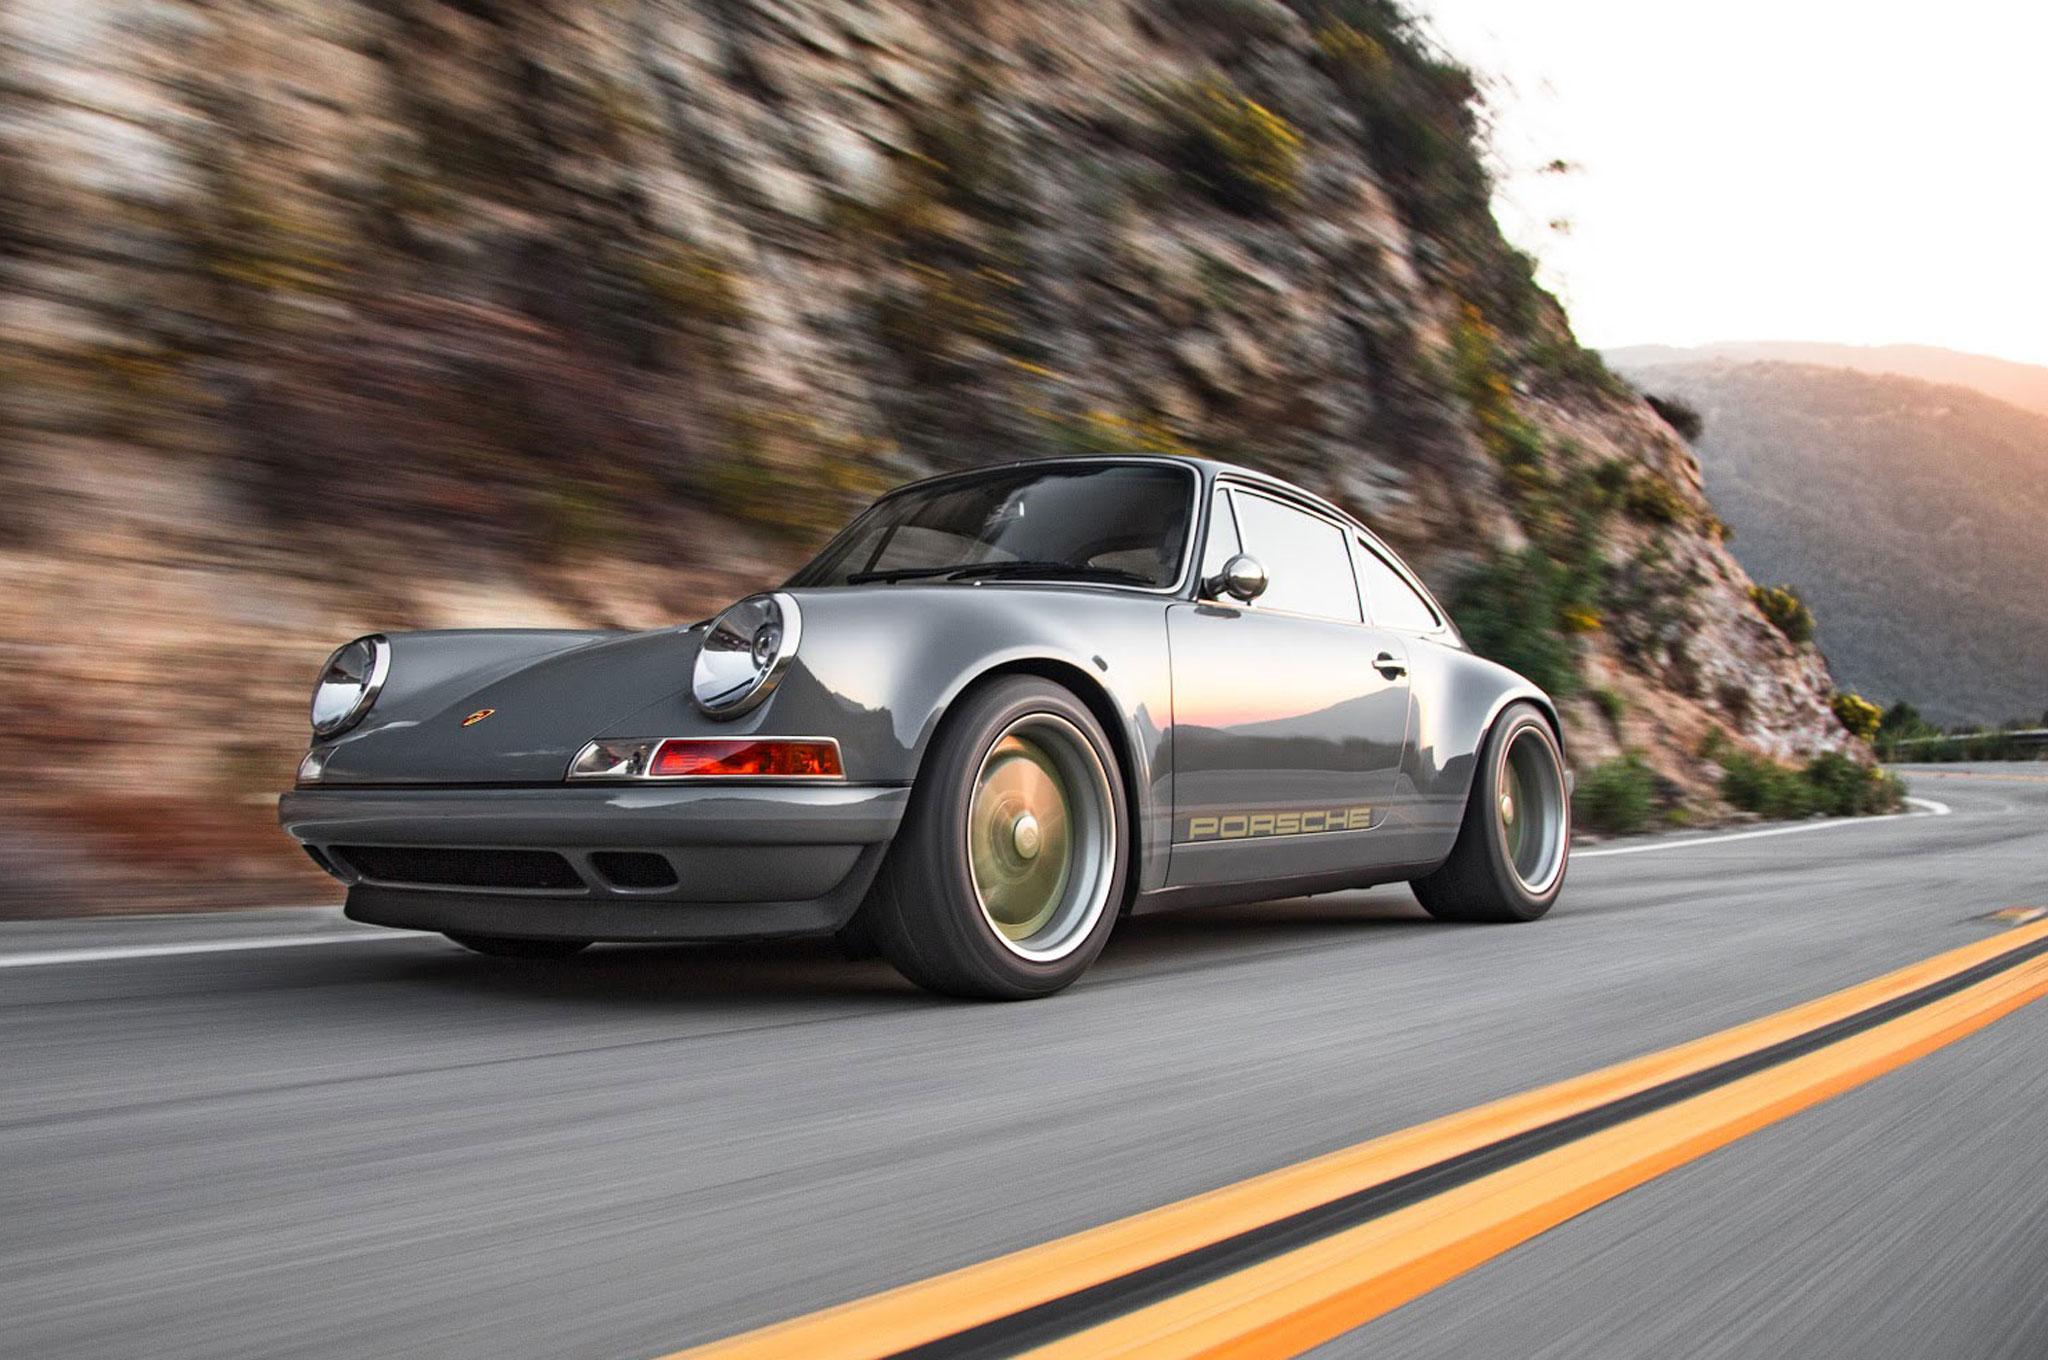 Driving The 1990 Porsche 911 Reimagined By Singer Vehicle Design Headlight Wiring Diagram 1968 1 83